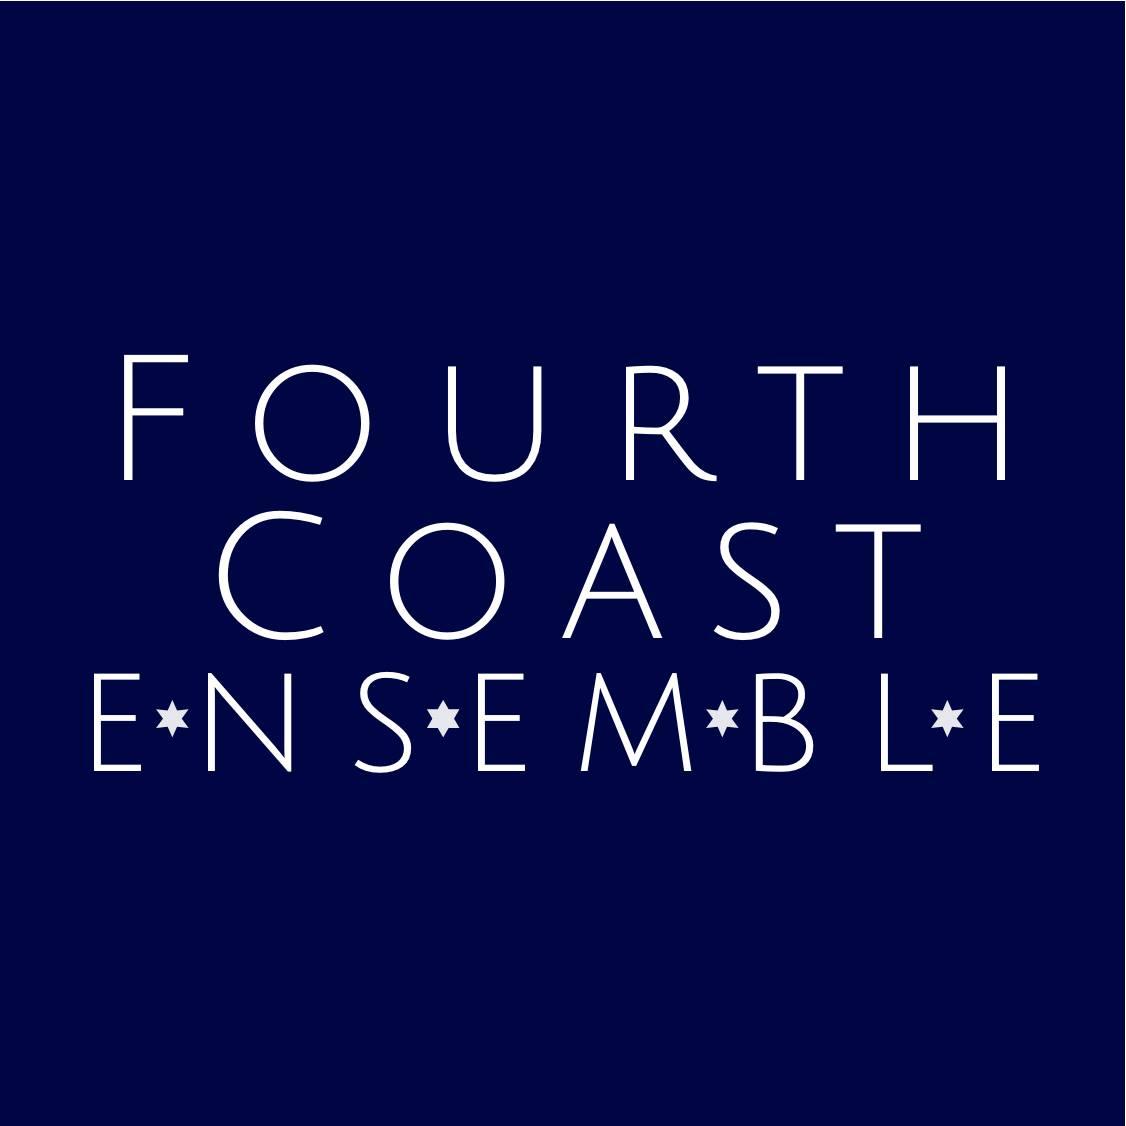 Fourth Coast Ensemble